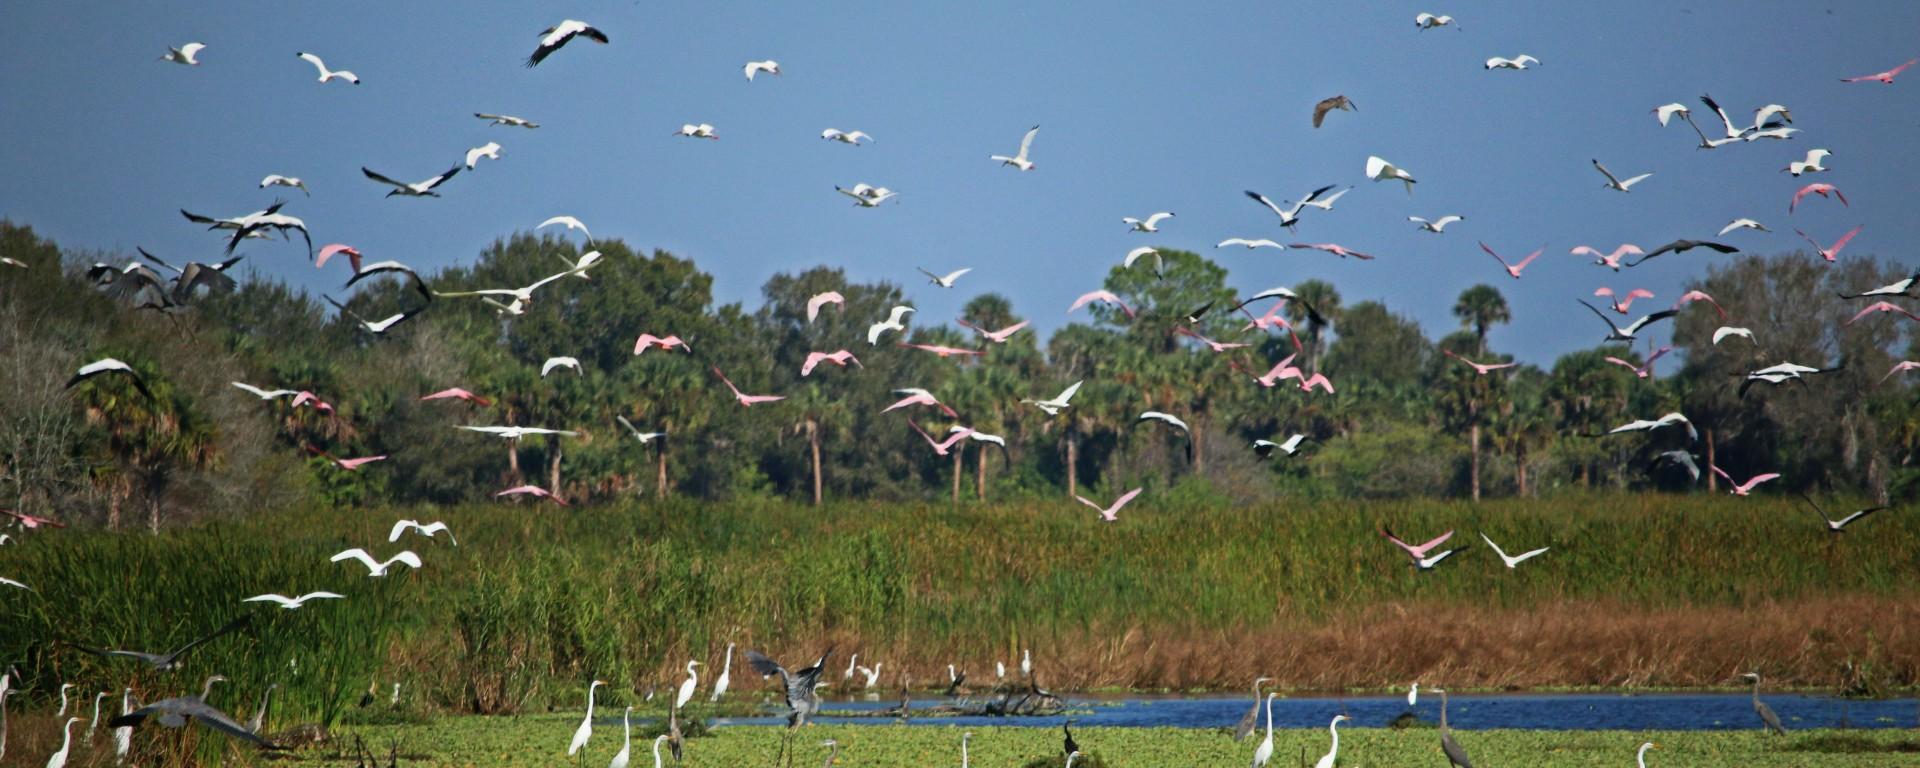 nature, florida, everglades, travel